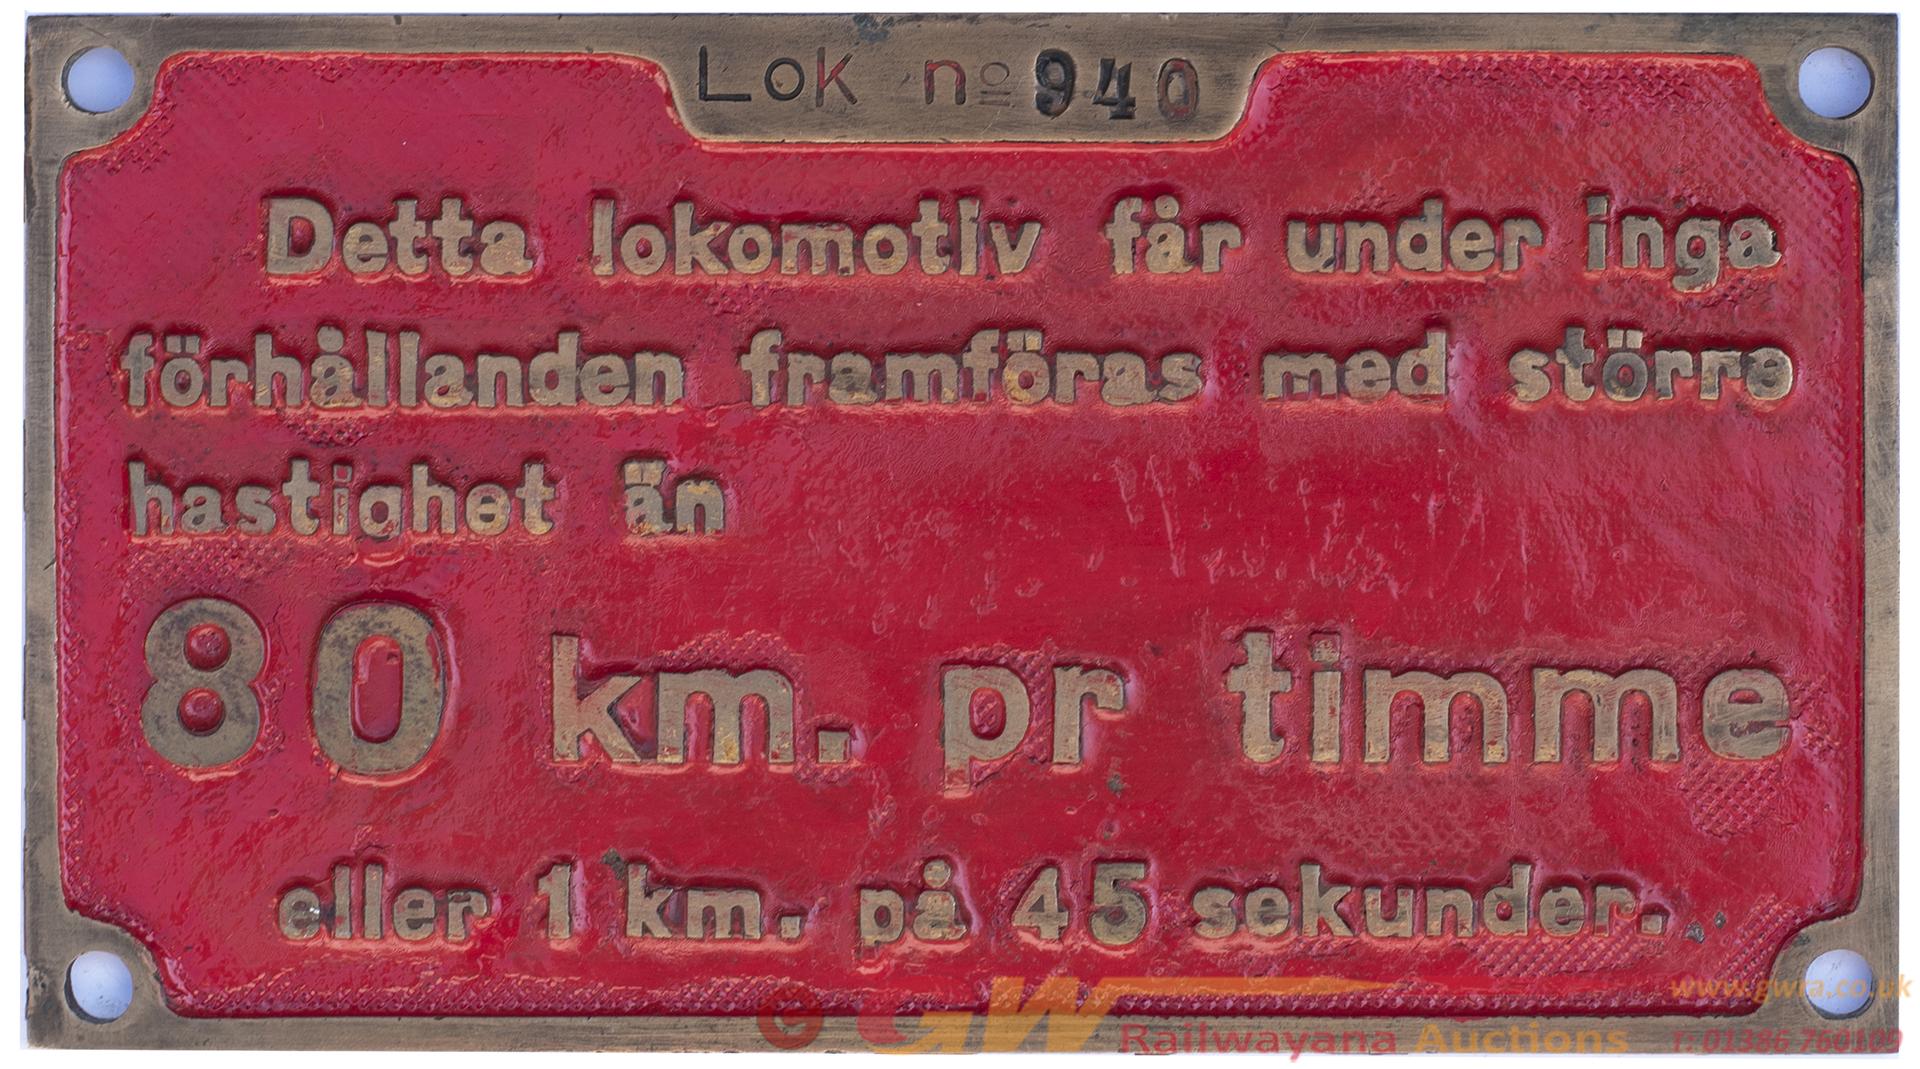 Cabplate LOK No 940: Ex Standard Gauge 2-6-2t New